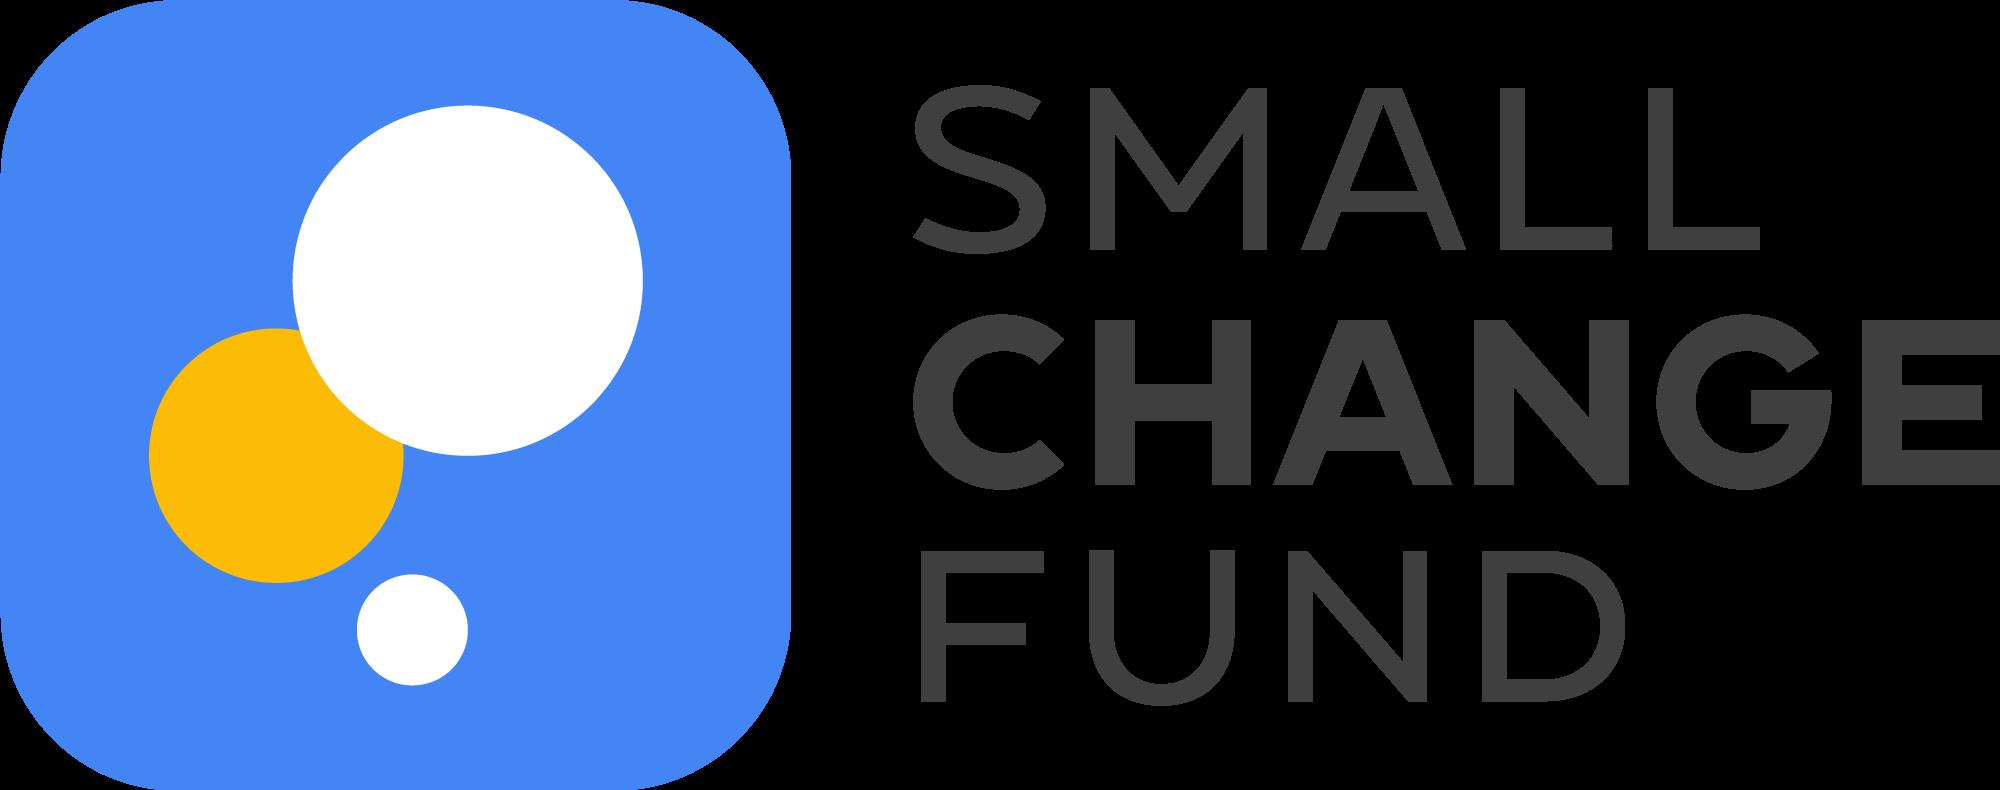 Small Change Fund